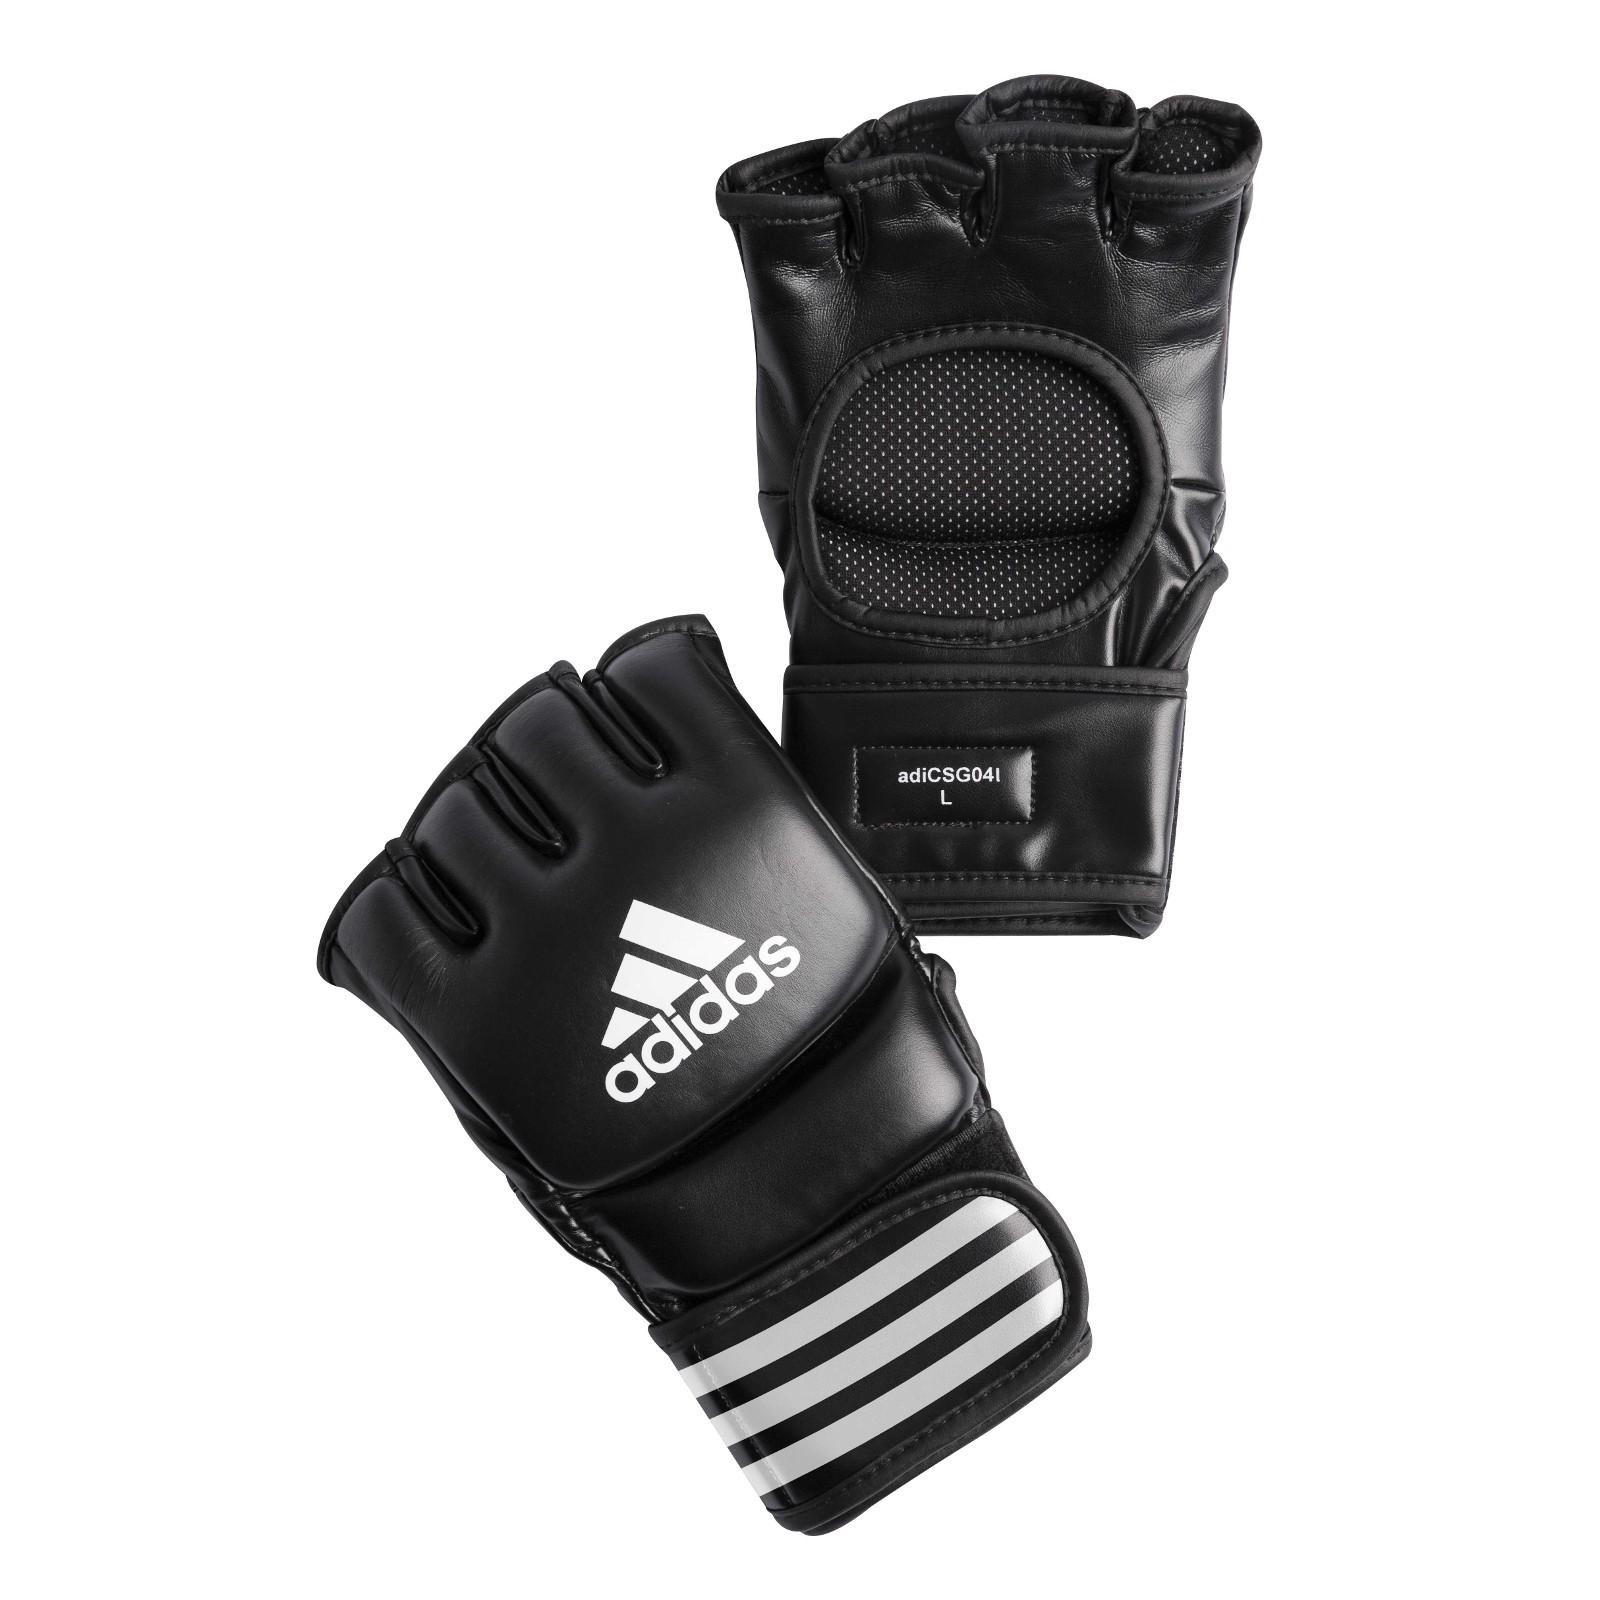 adidas ultimate fight glove g nstig kaufen sport tiedje. Black Bedroom Furniture Sets. Home Design Ideas